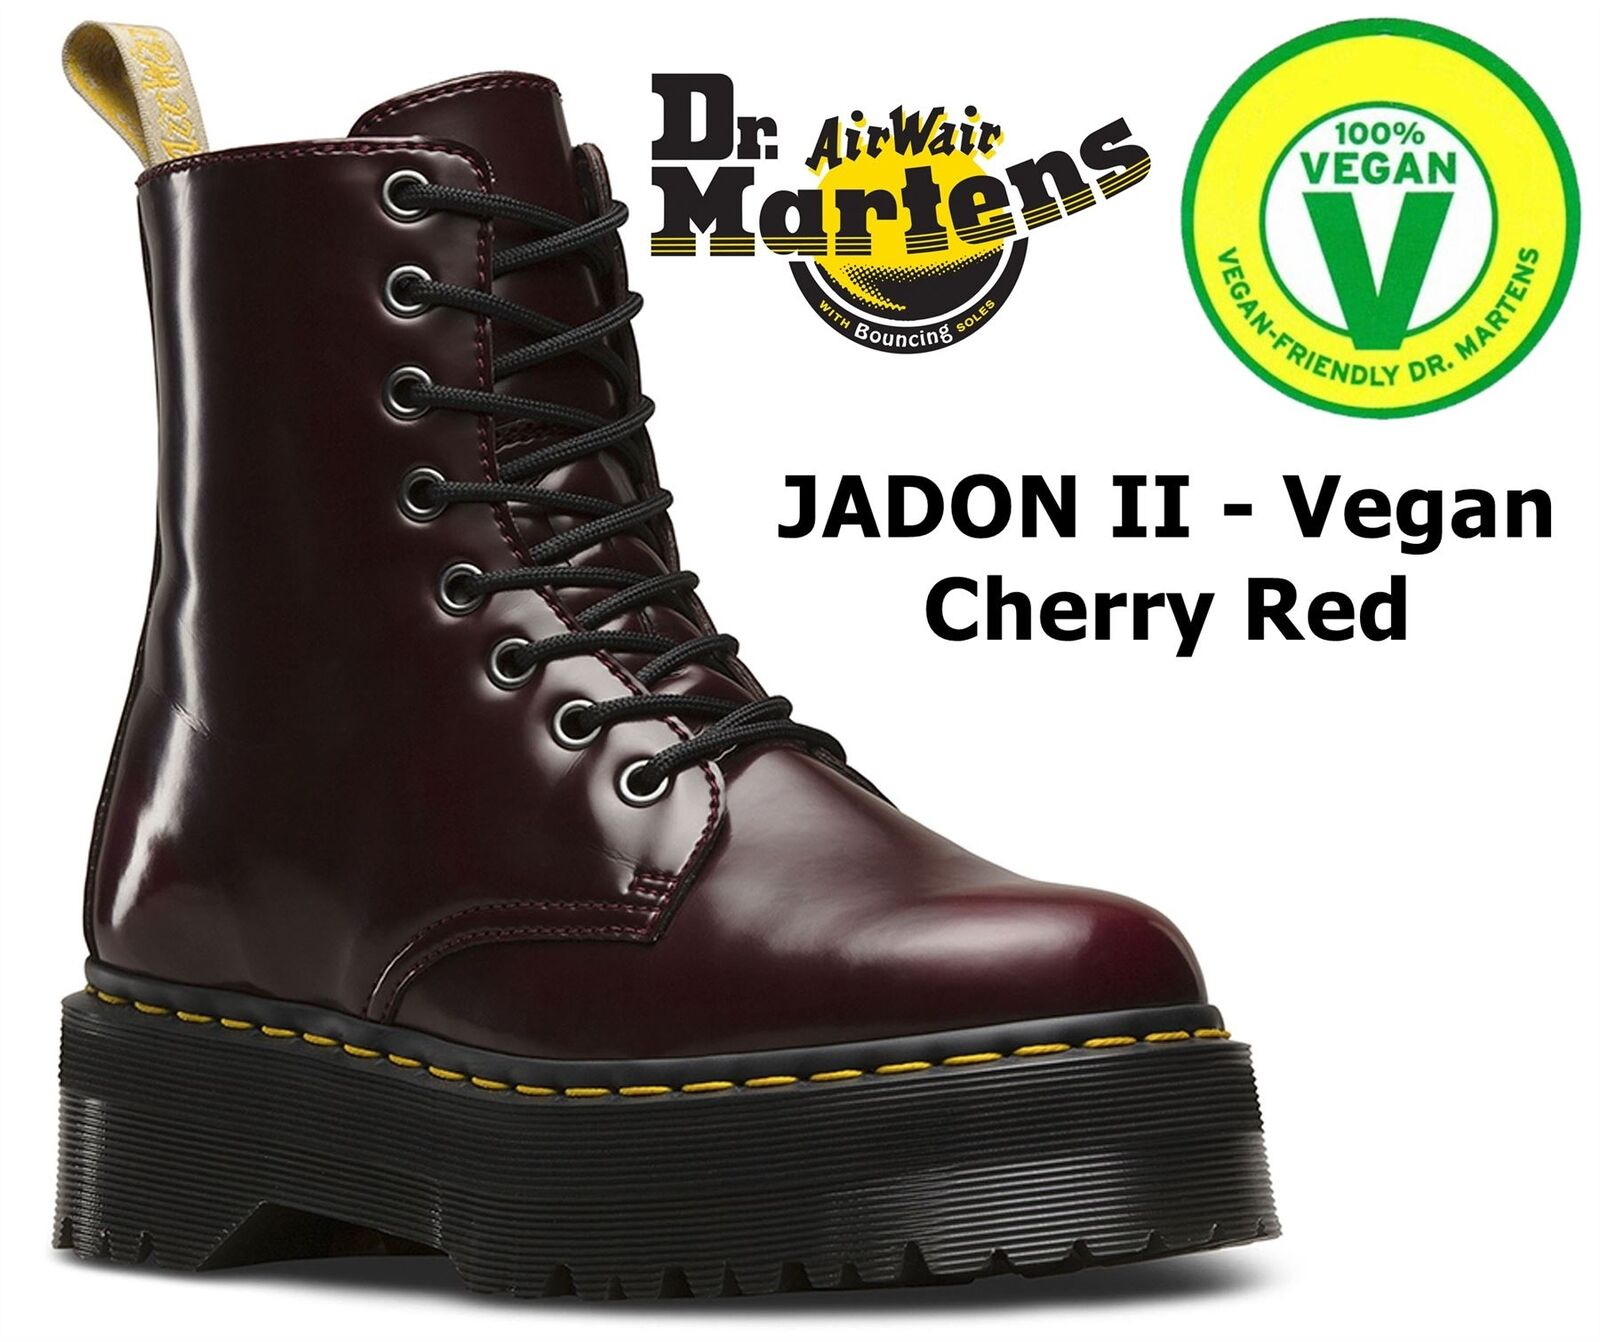 DR Martens Jadon Vegan 80 S stile QUAD QUAD QUAD Retrò Rosso Ciliegia Cambridge Pennello Zip Stivali 34366a